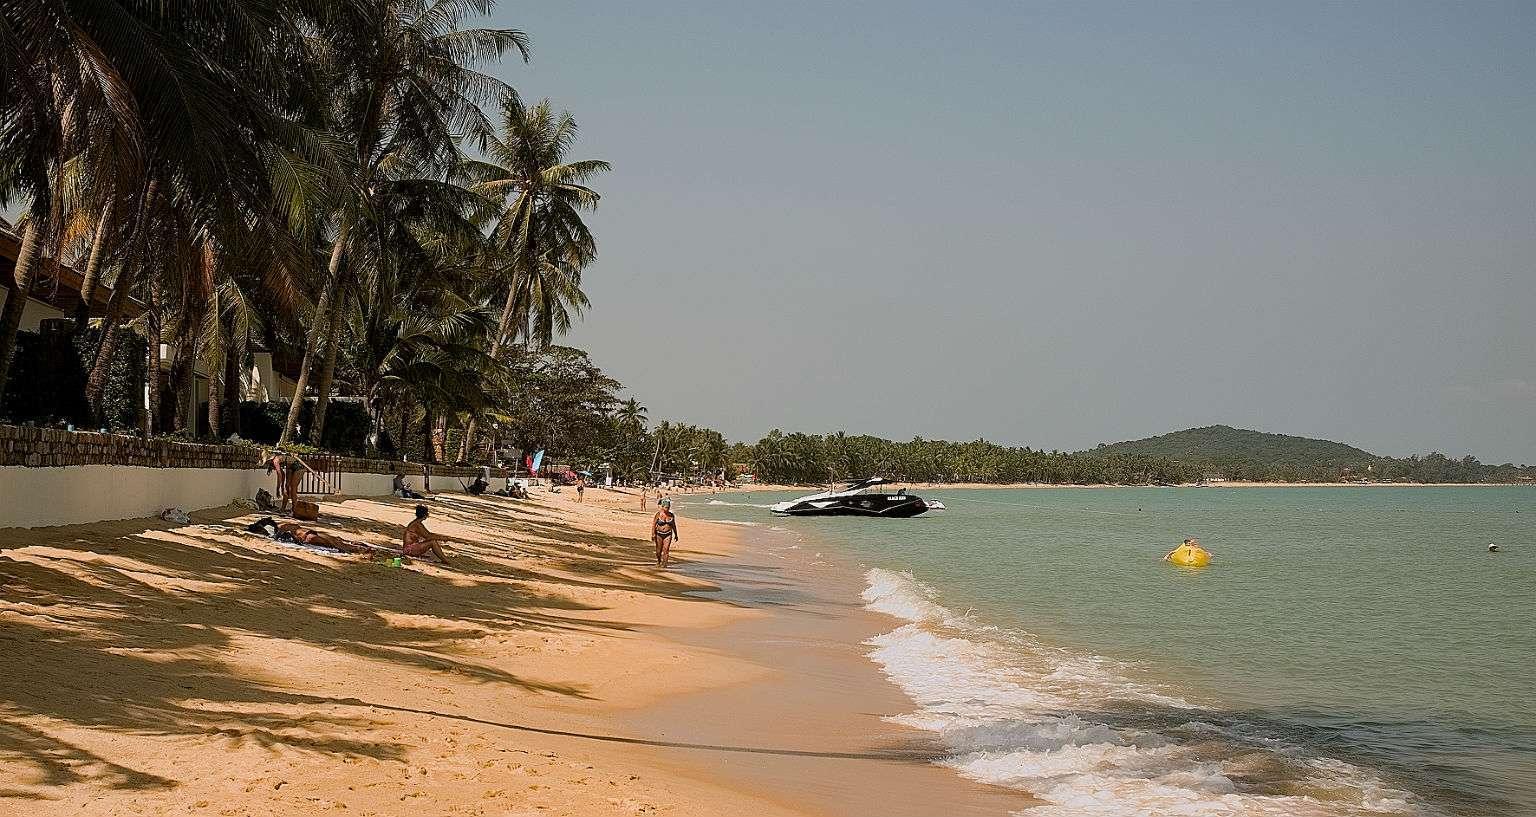 Maenam Beach, goudgeel langgerekt strand omzoomd met palmbomen.